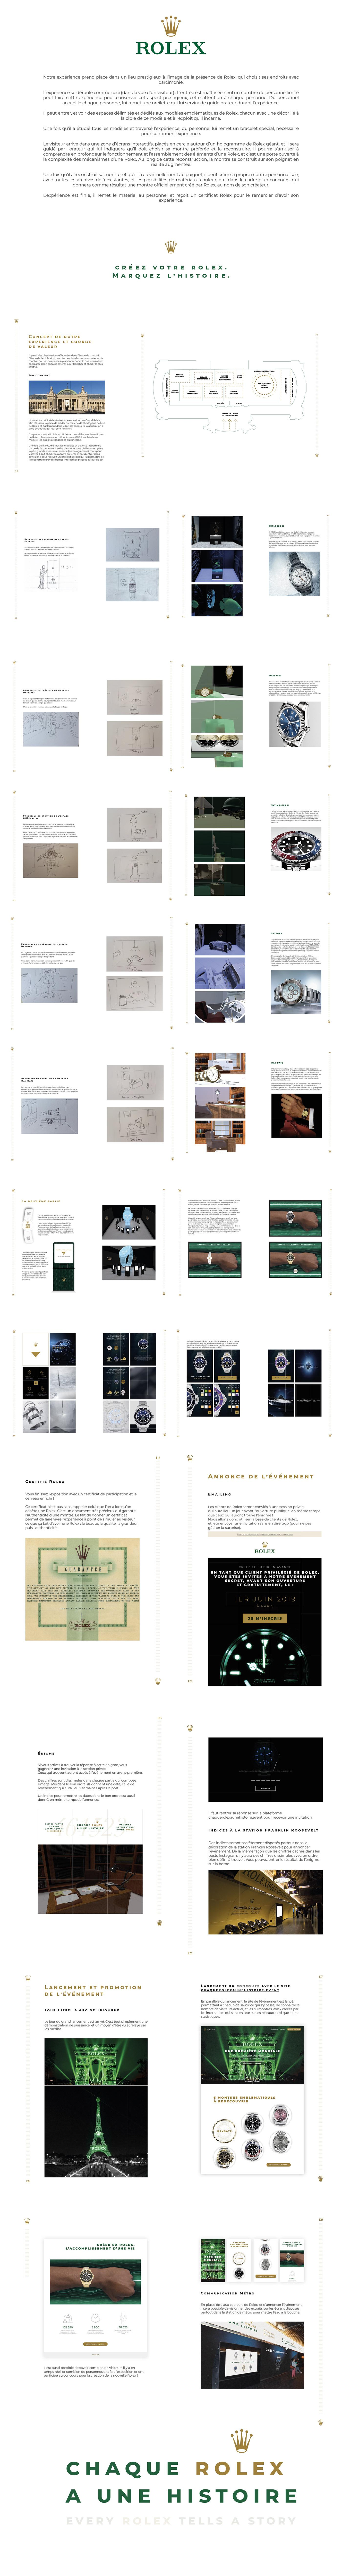 design Webdesign photoshop graphic Illustrator 3D